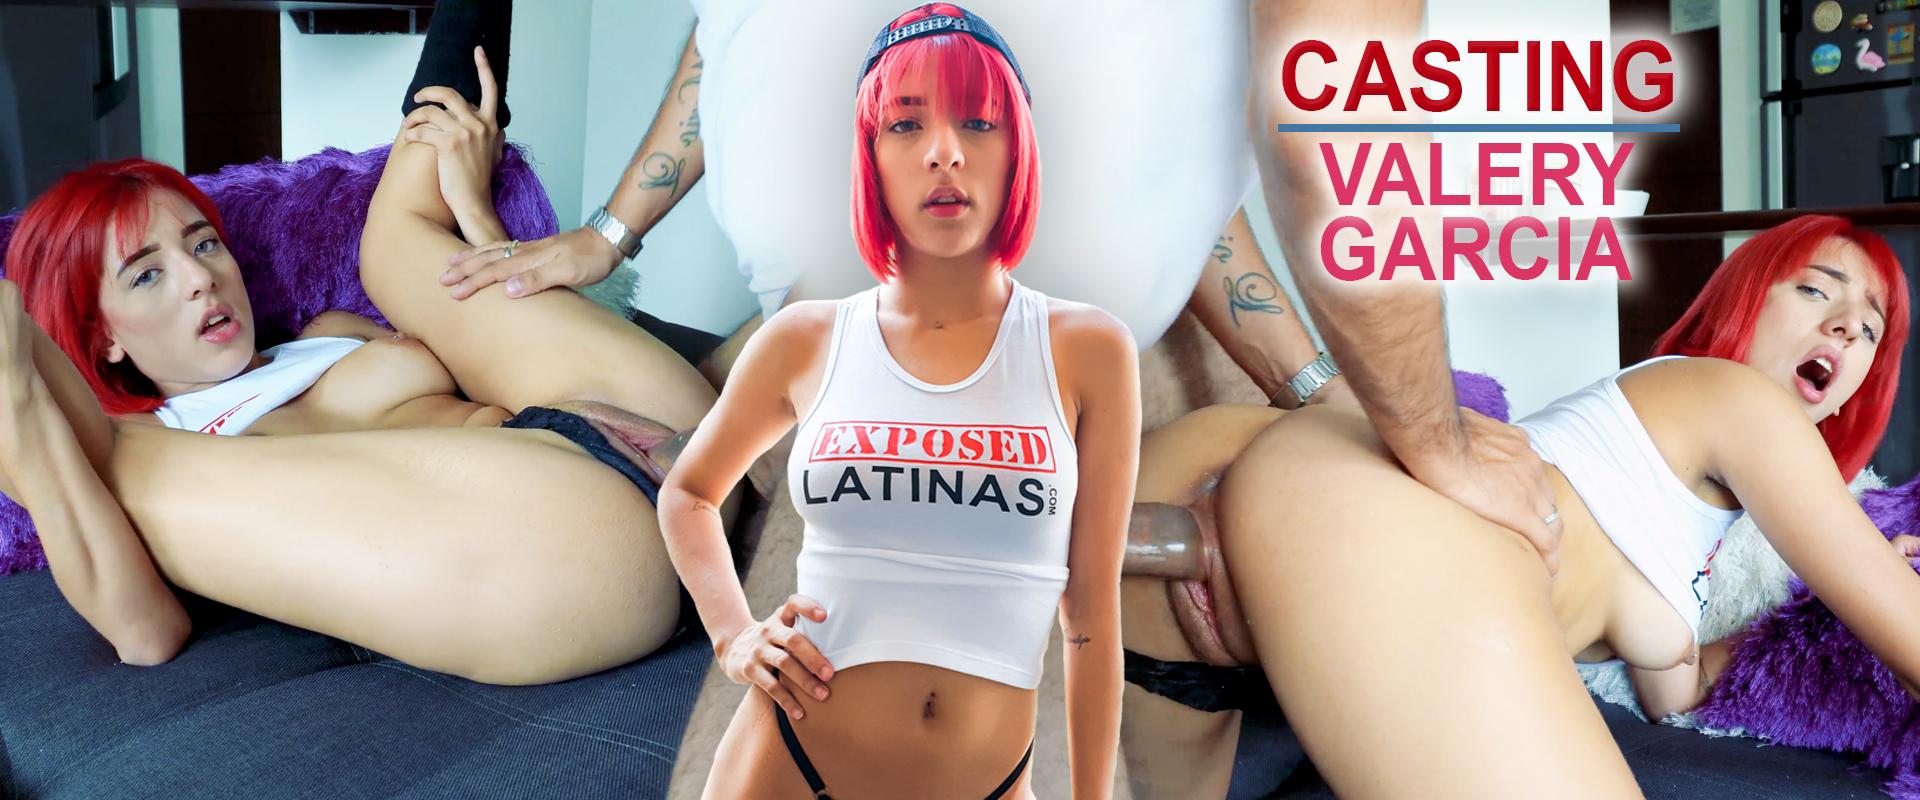 Valery Garcia casting porno porn